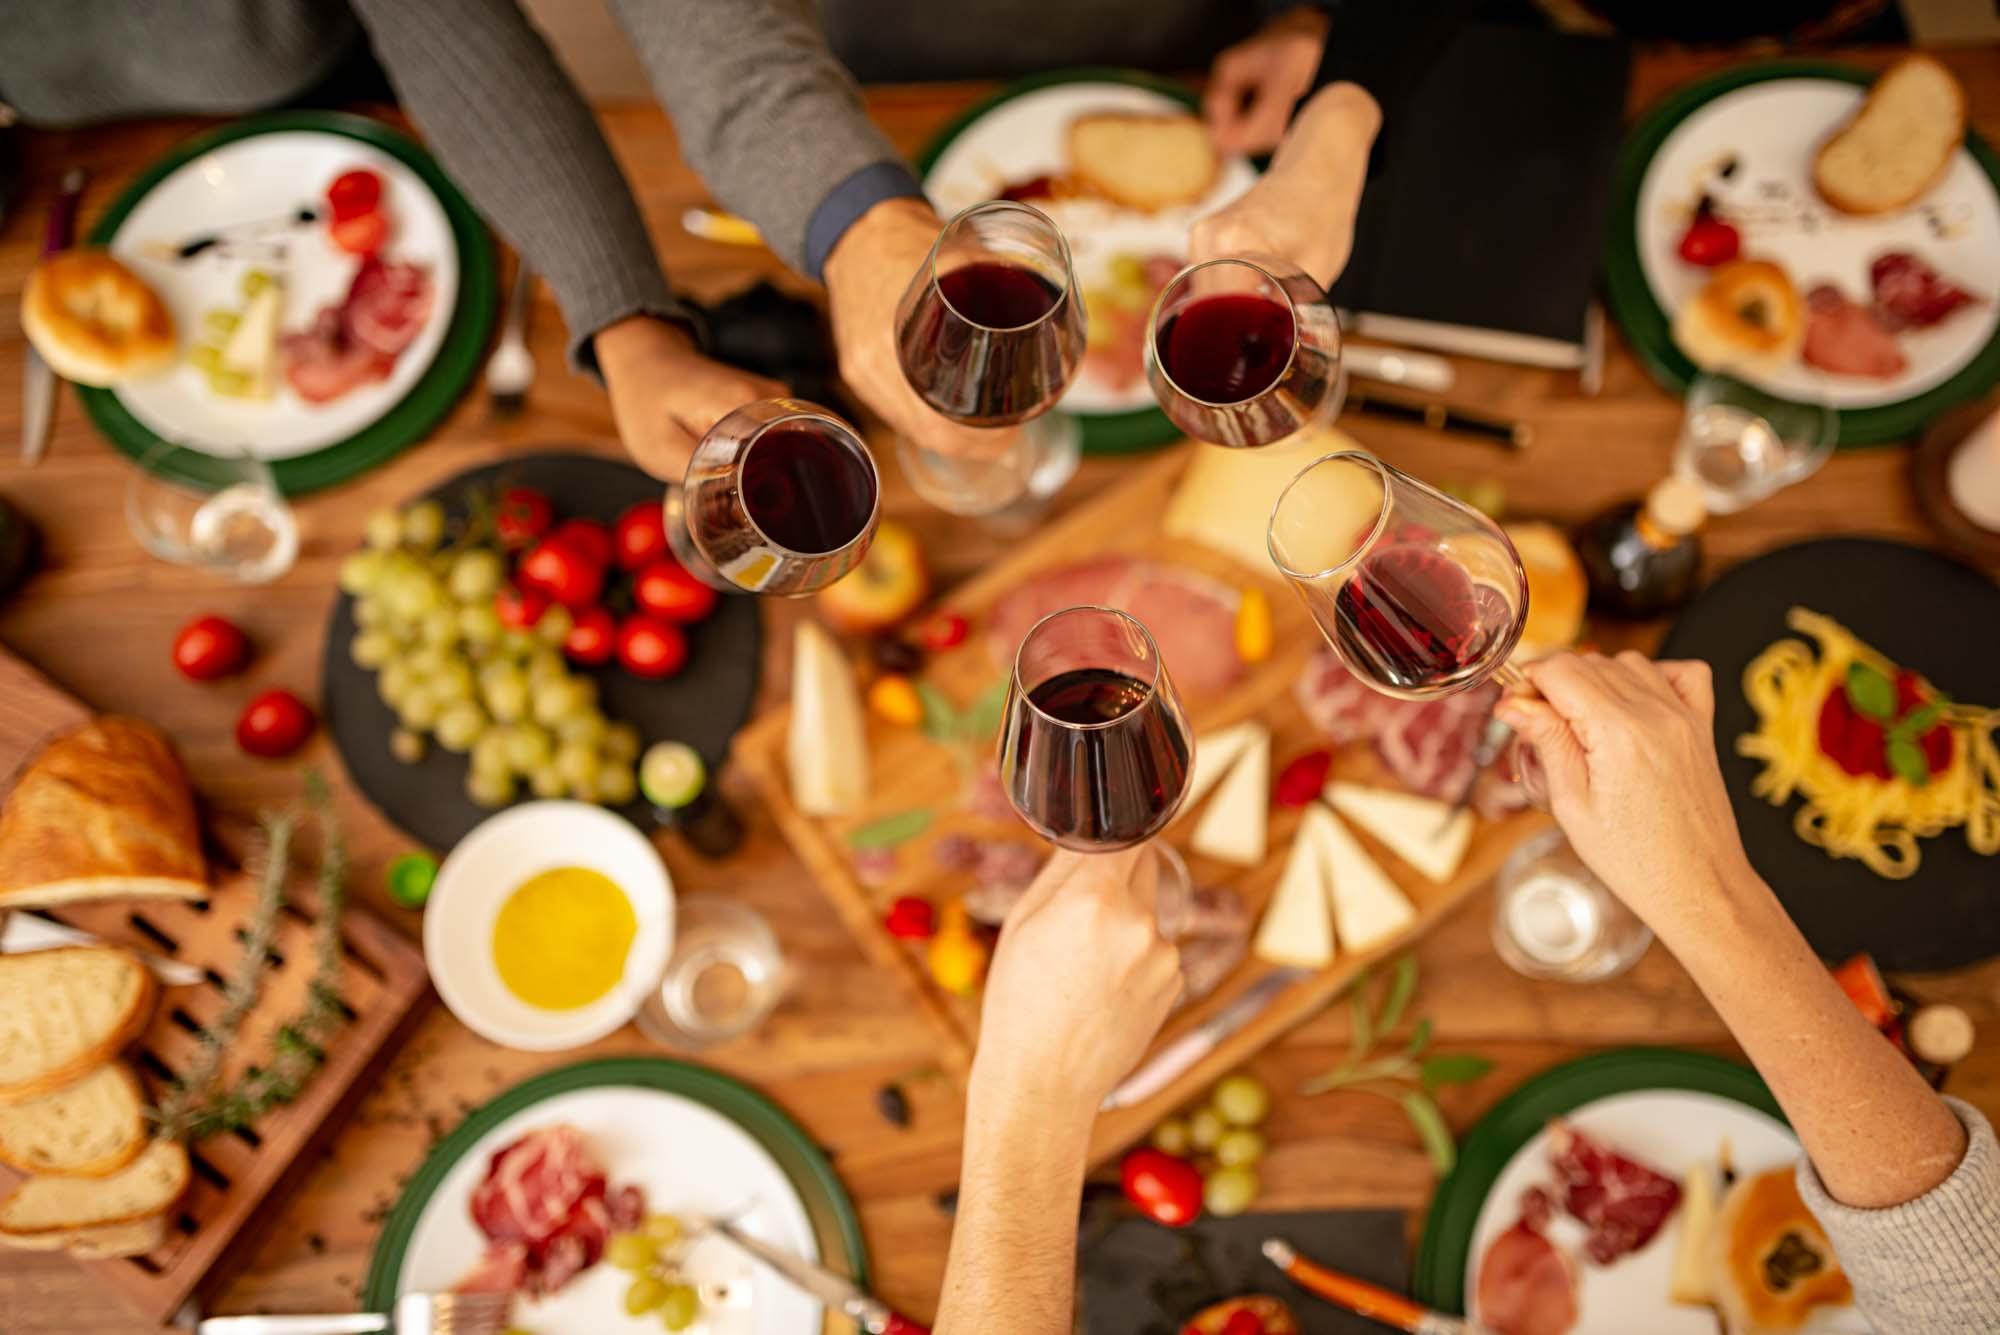 Cucina Amatoriale Cene Aziendali a Milano